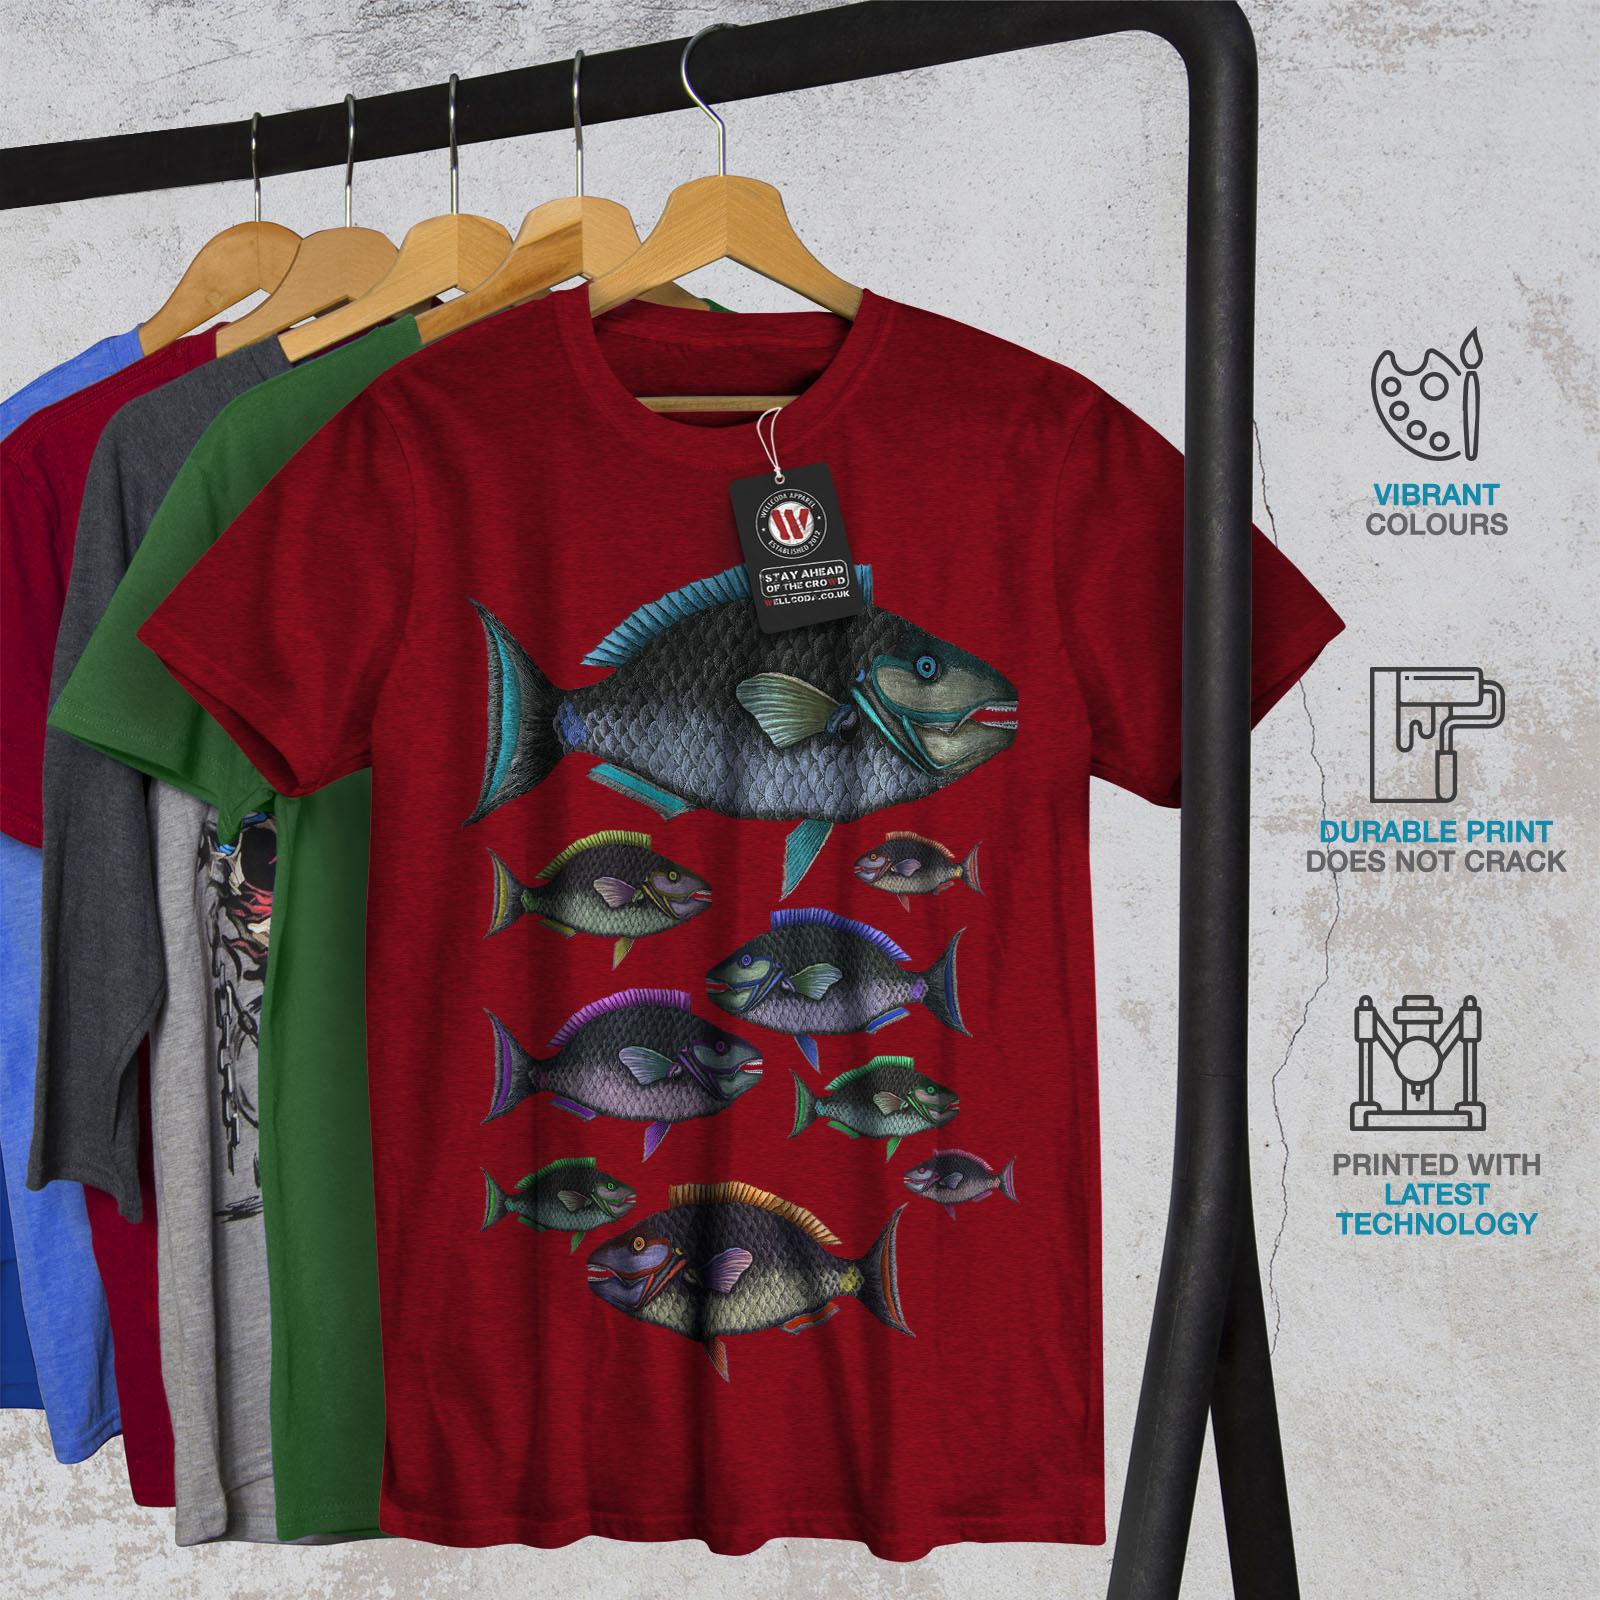 Wellcoda Color Fish Nature Mens T-shirt, Water Graphic Design ...